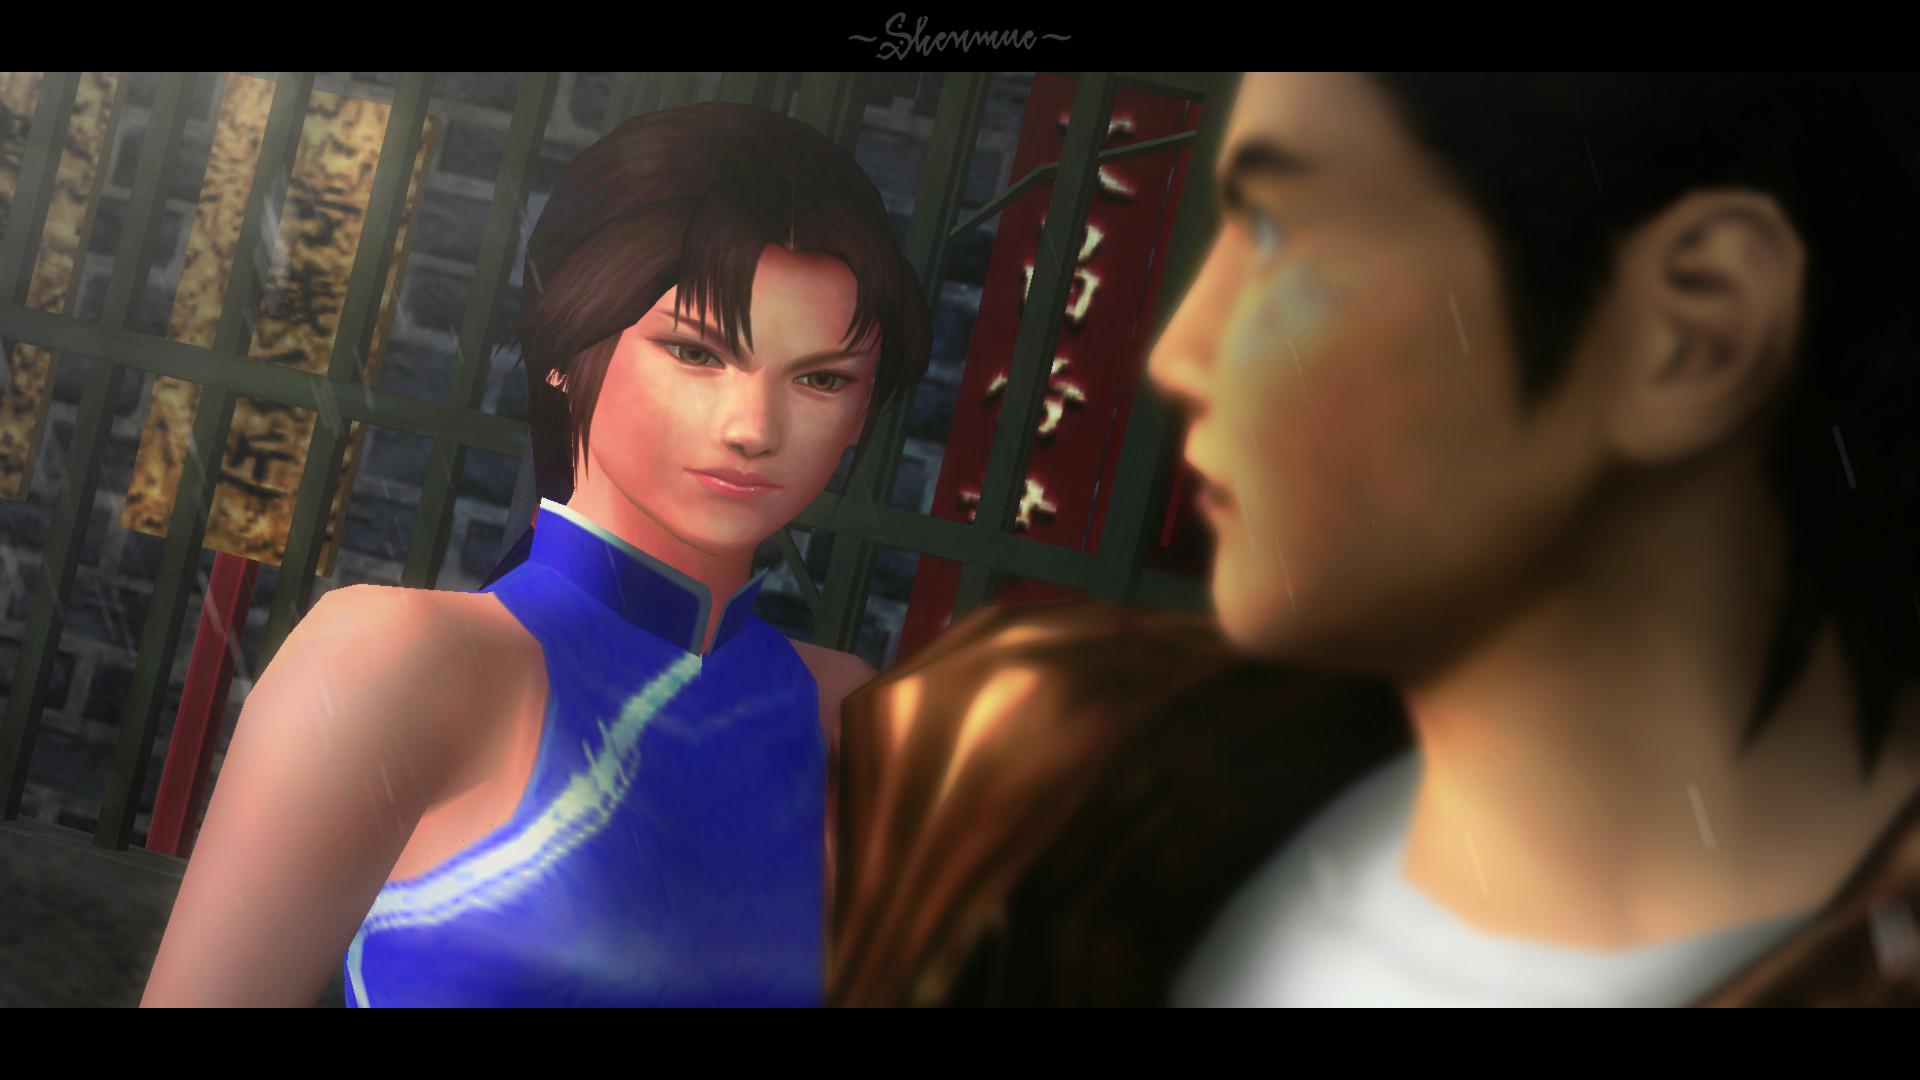 shenmue, Sega, Dreamcast, Video Games